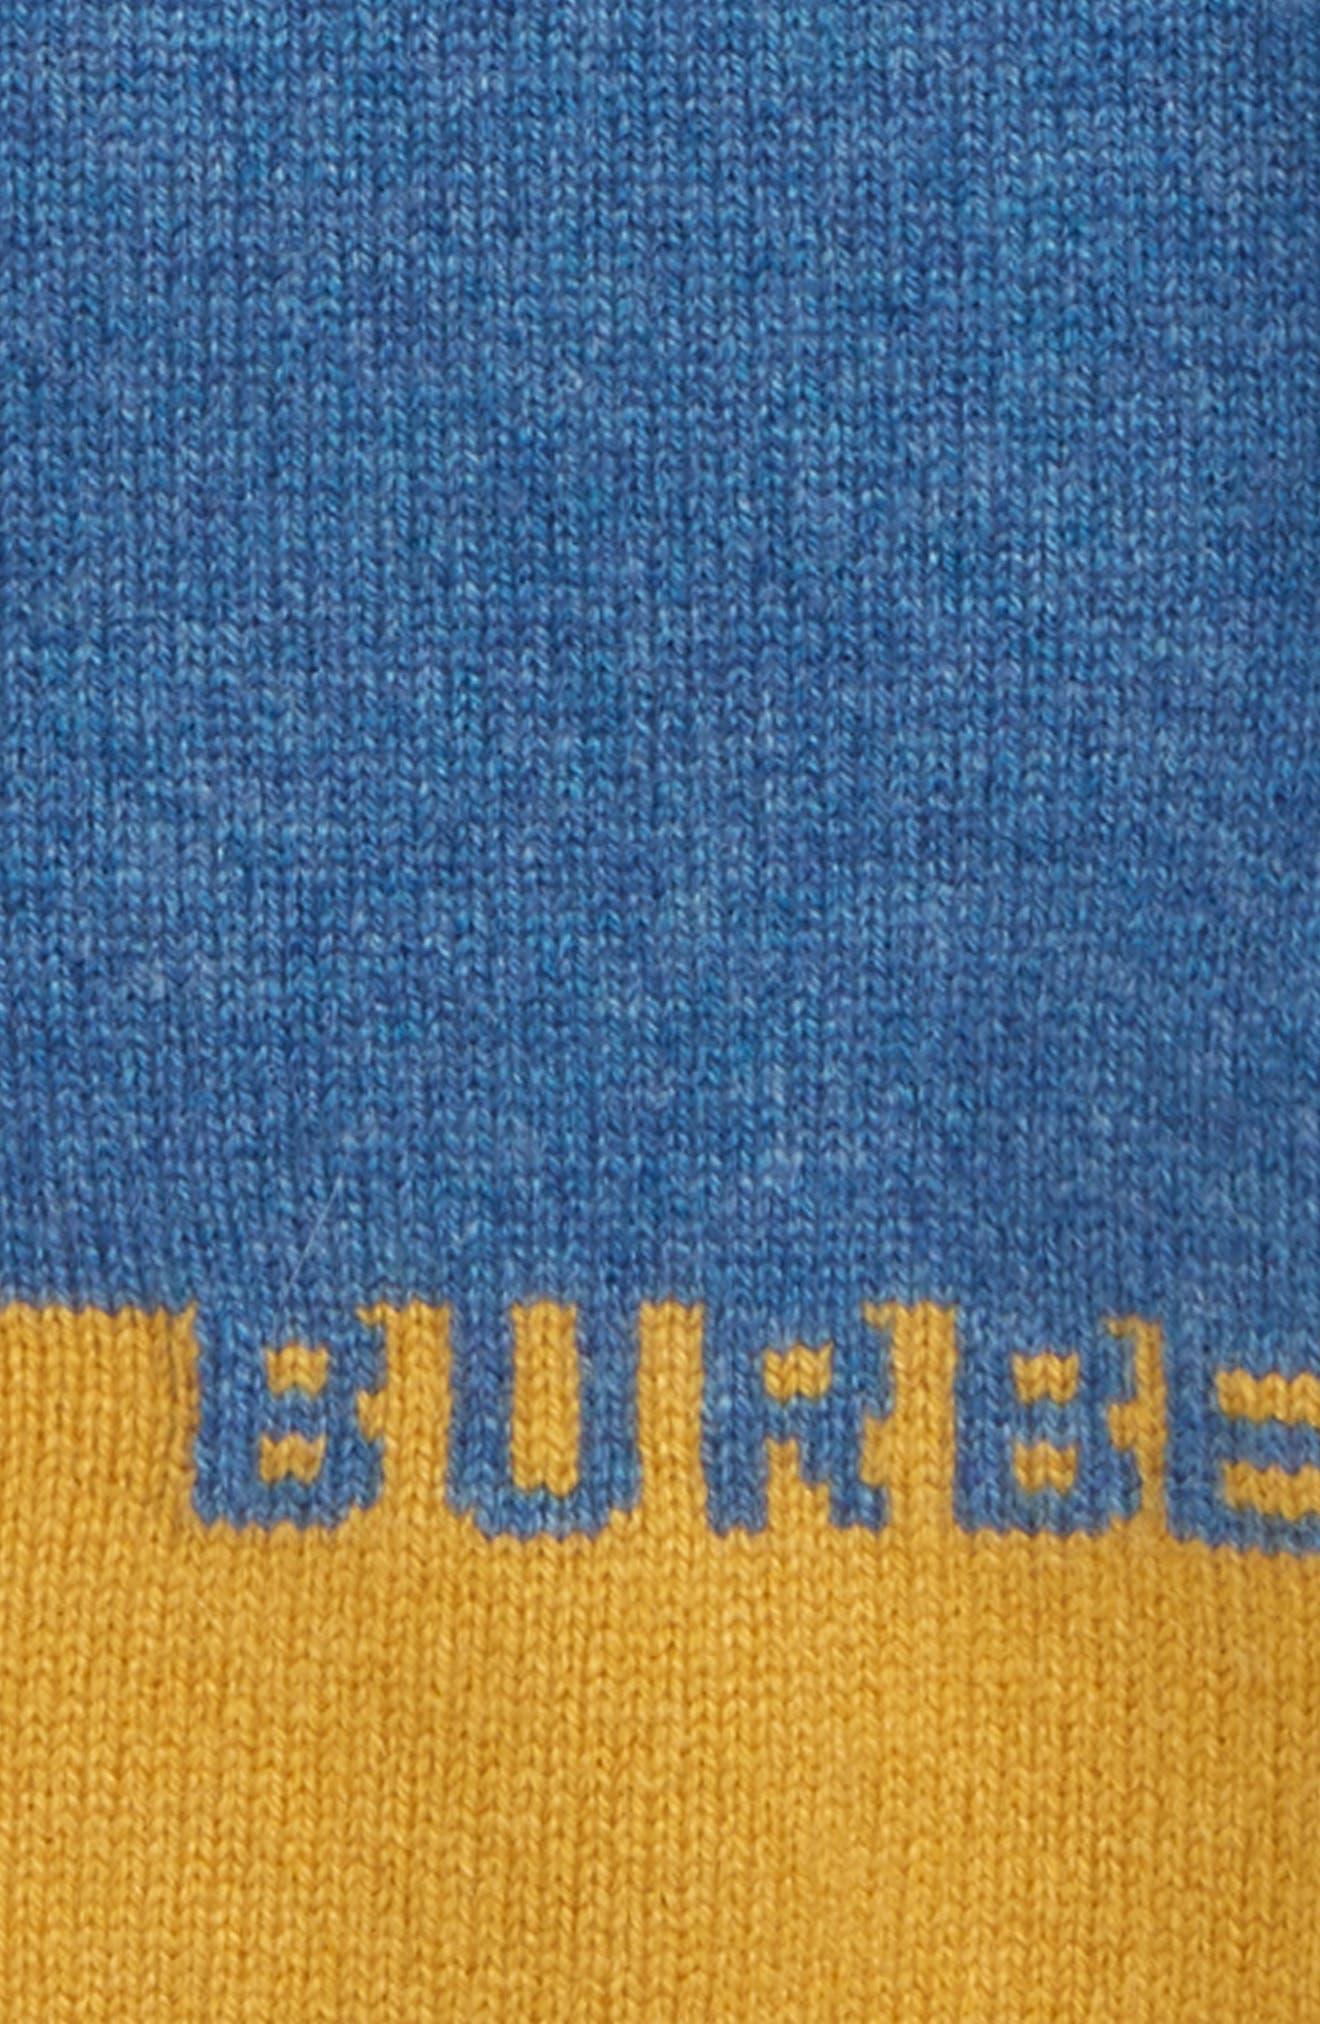 BURBERRY, Alister Cashmere Sweater, Alternate thumbnail 2, color, DUSTY BLUE MELANGE